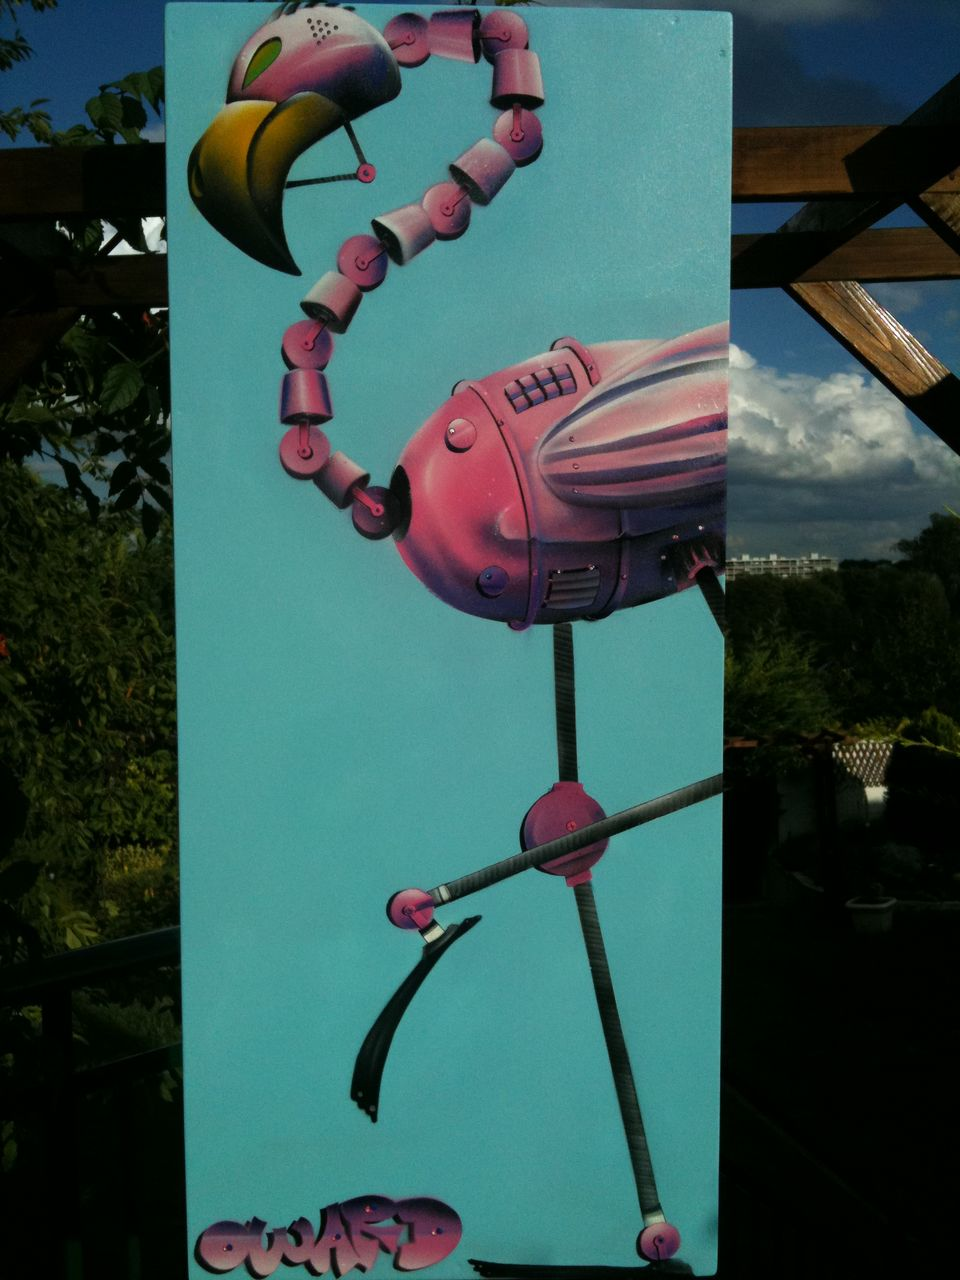 oward Spray pink floyd mécanik